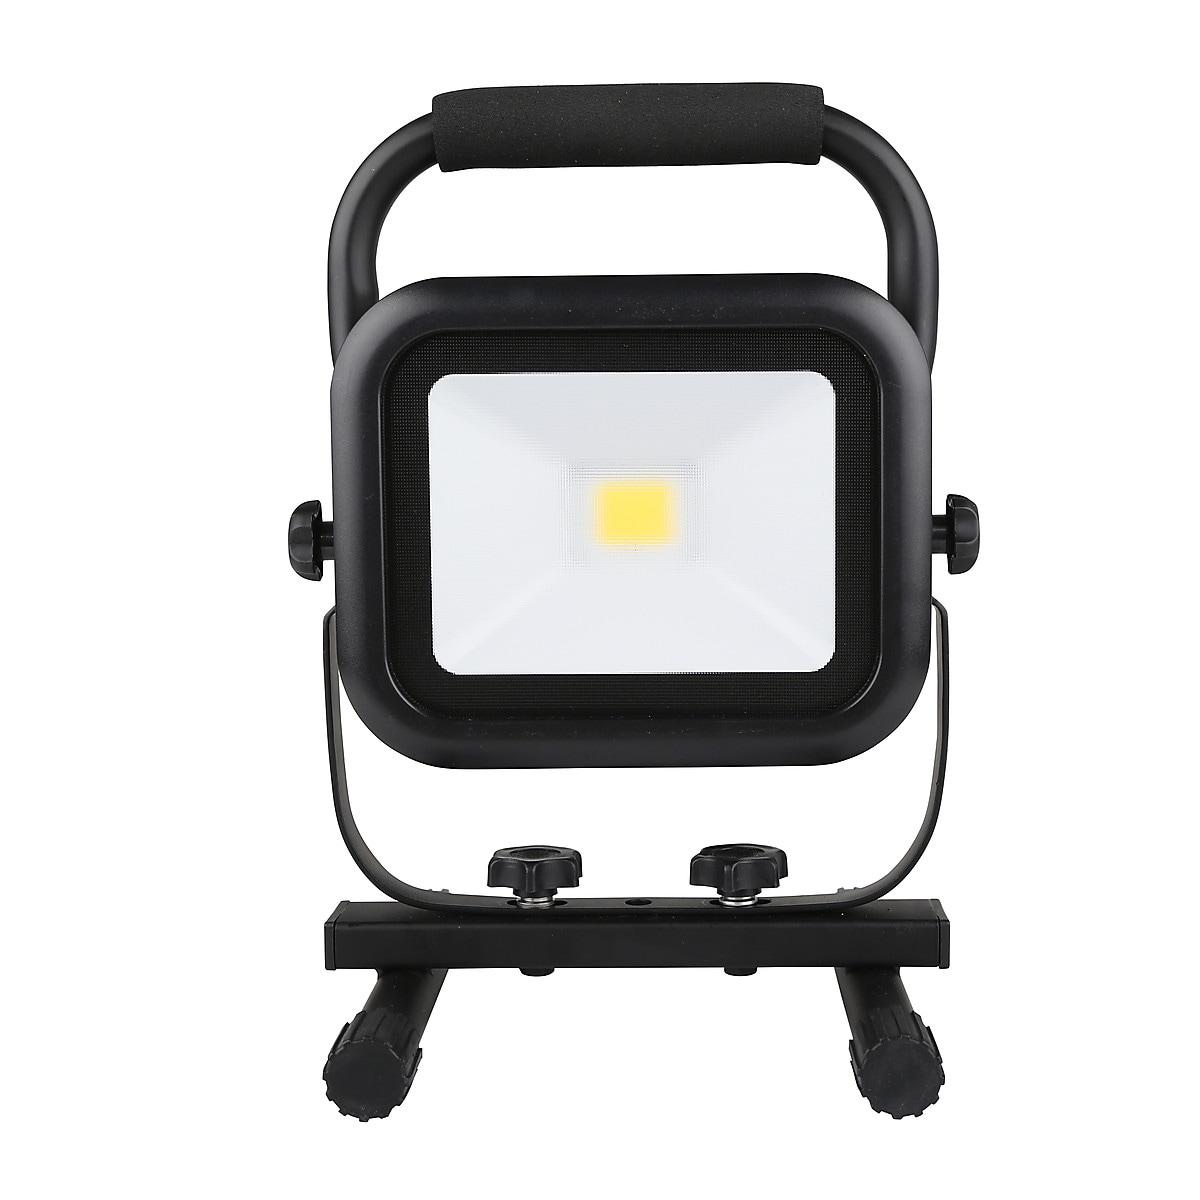 LED-strålkastare 30 W 2550 lm